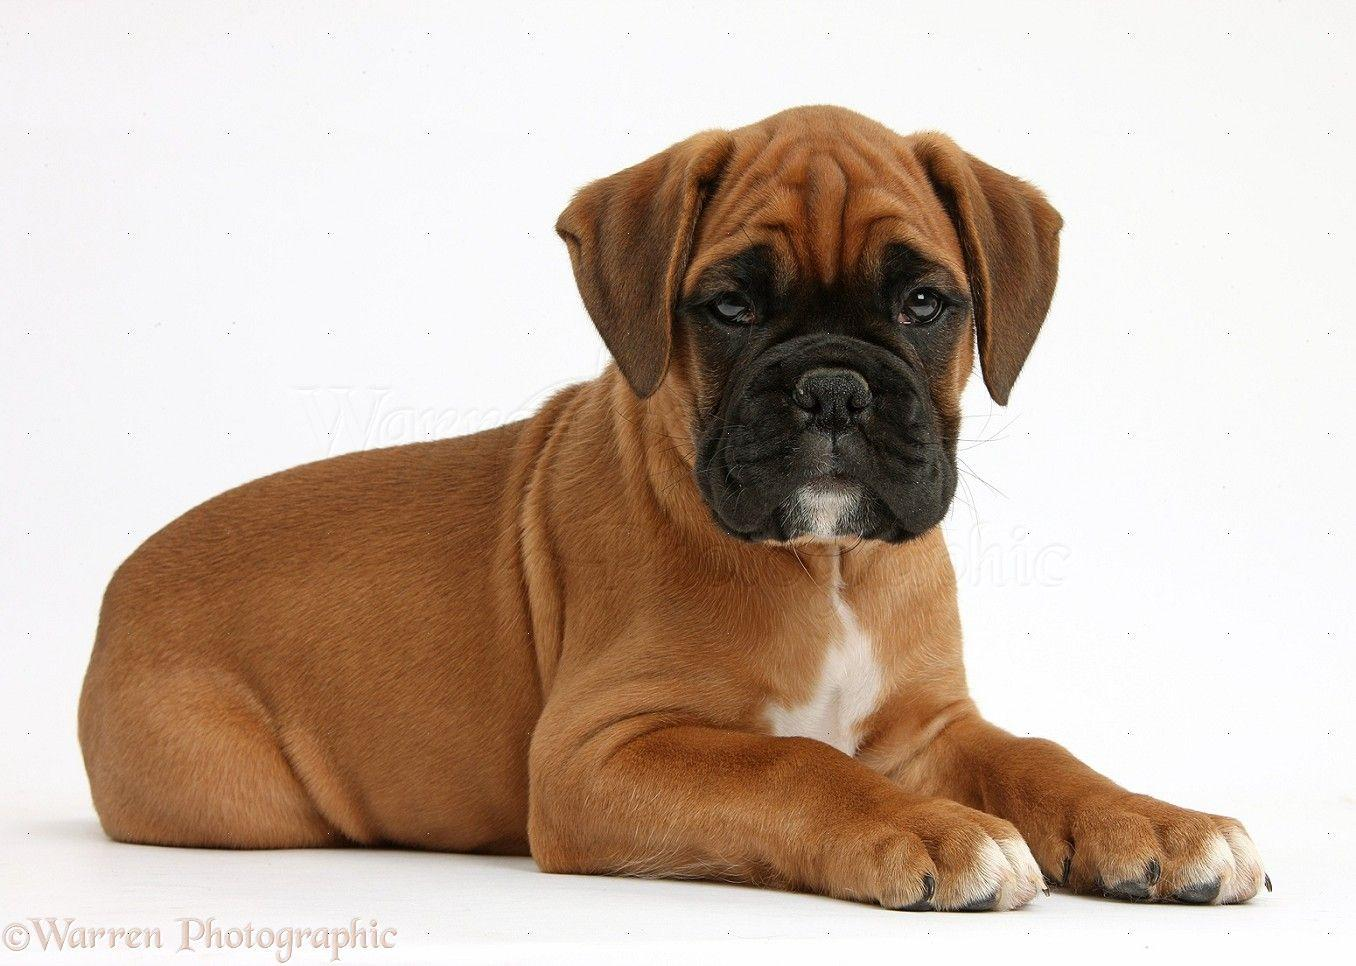 Boxer Dog Wallpapers - Wallpaper Cave  |Boxer Puppies Wallpaper